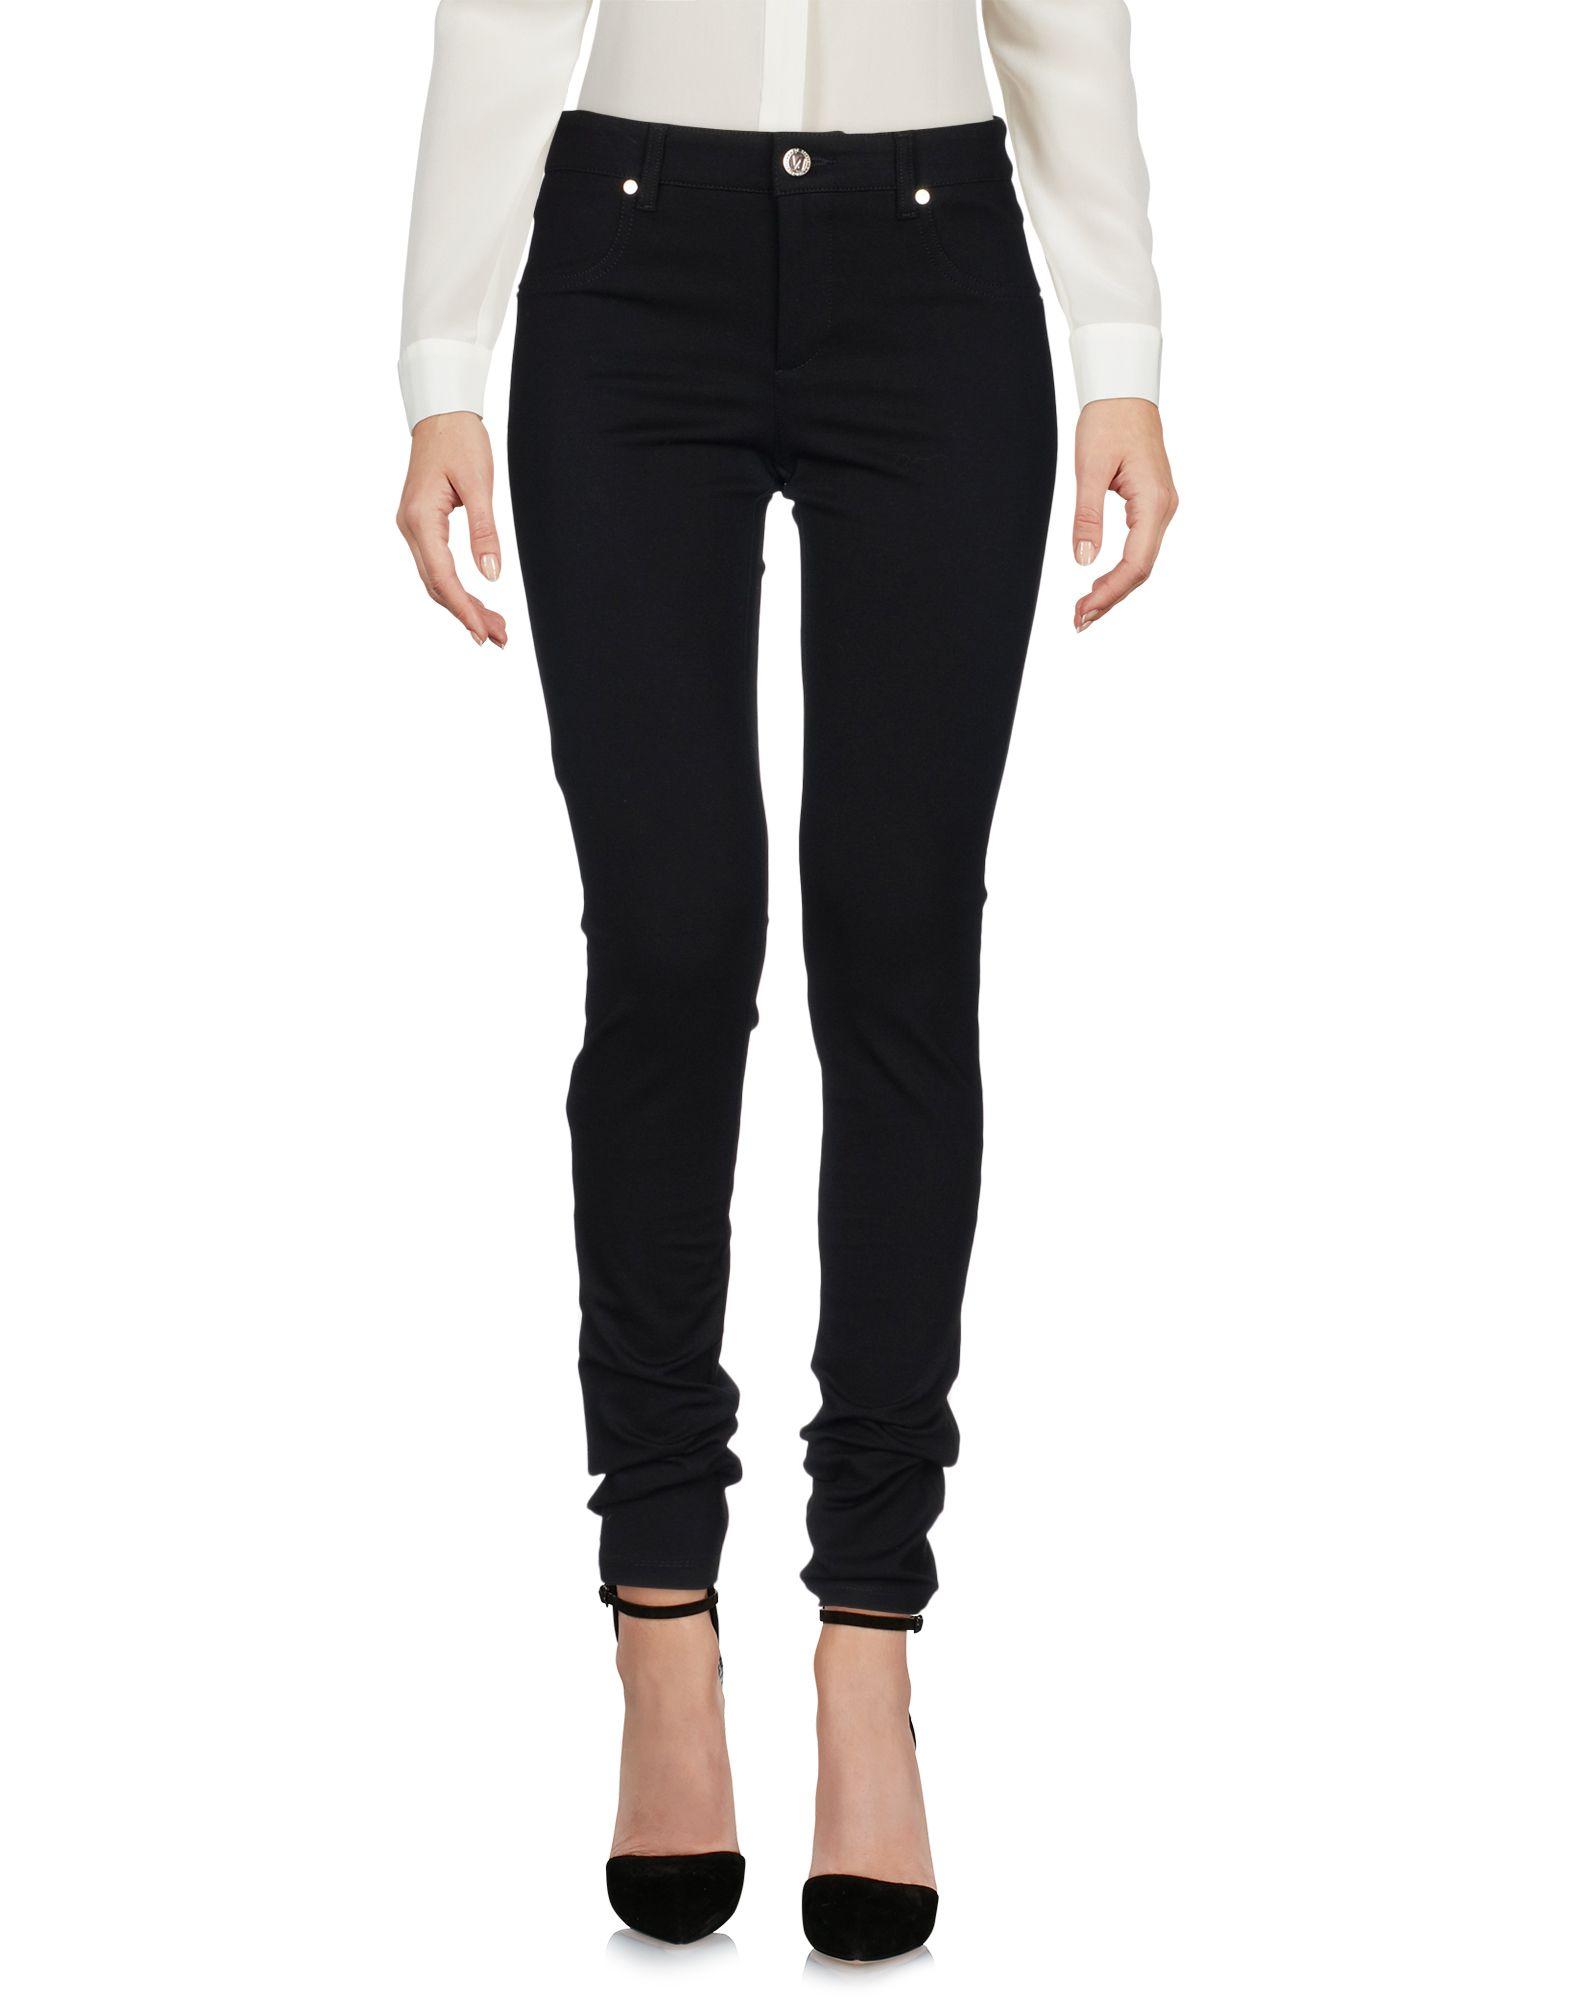 Pantalone Versace Jeans damen - 13207188NR